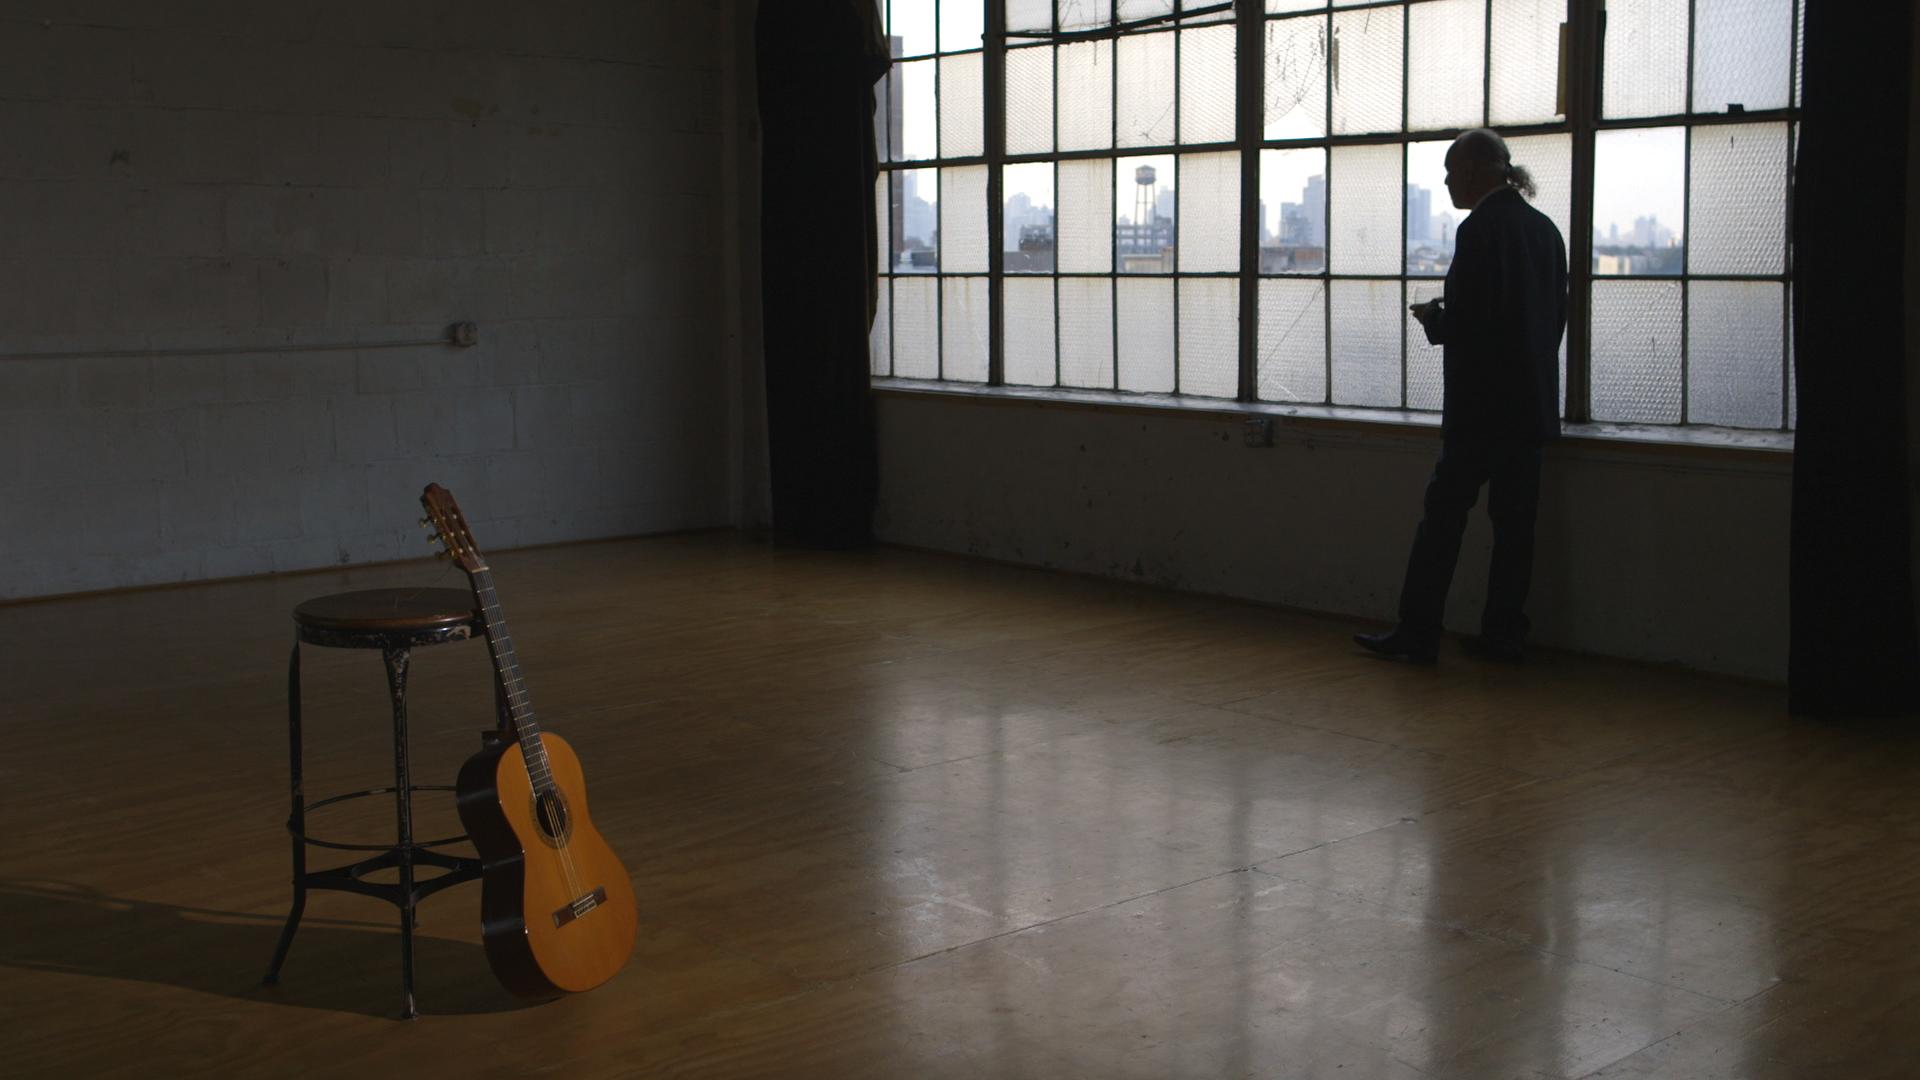 Composer/Guitarist Eric Kamen